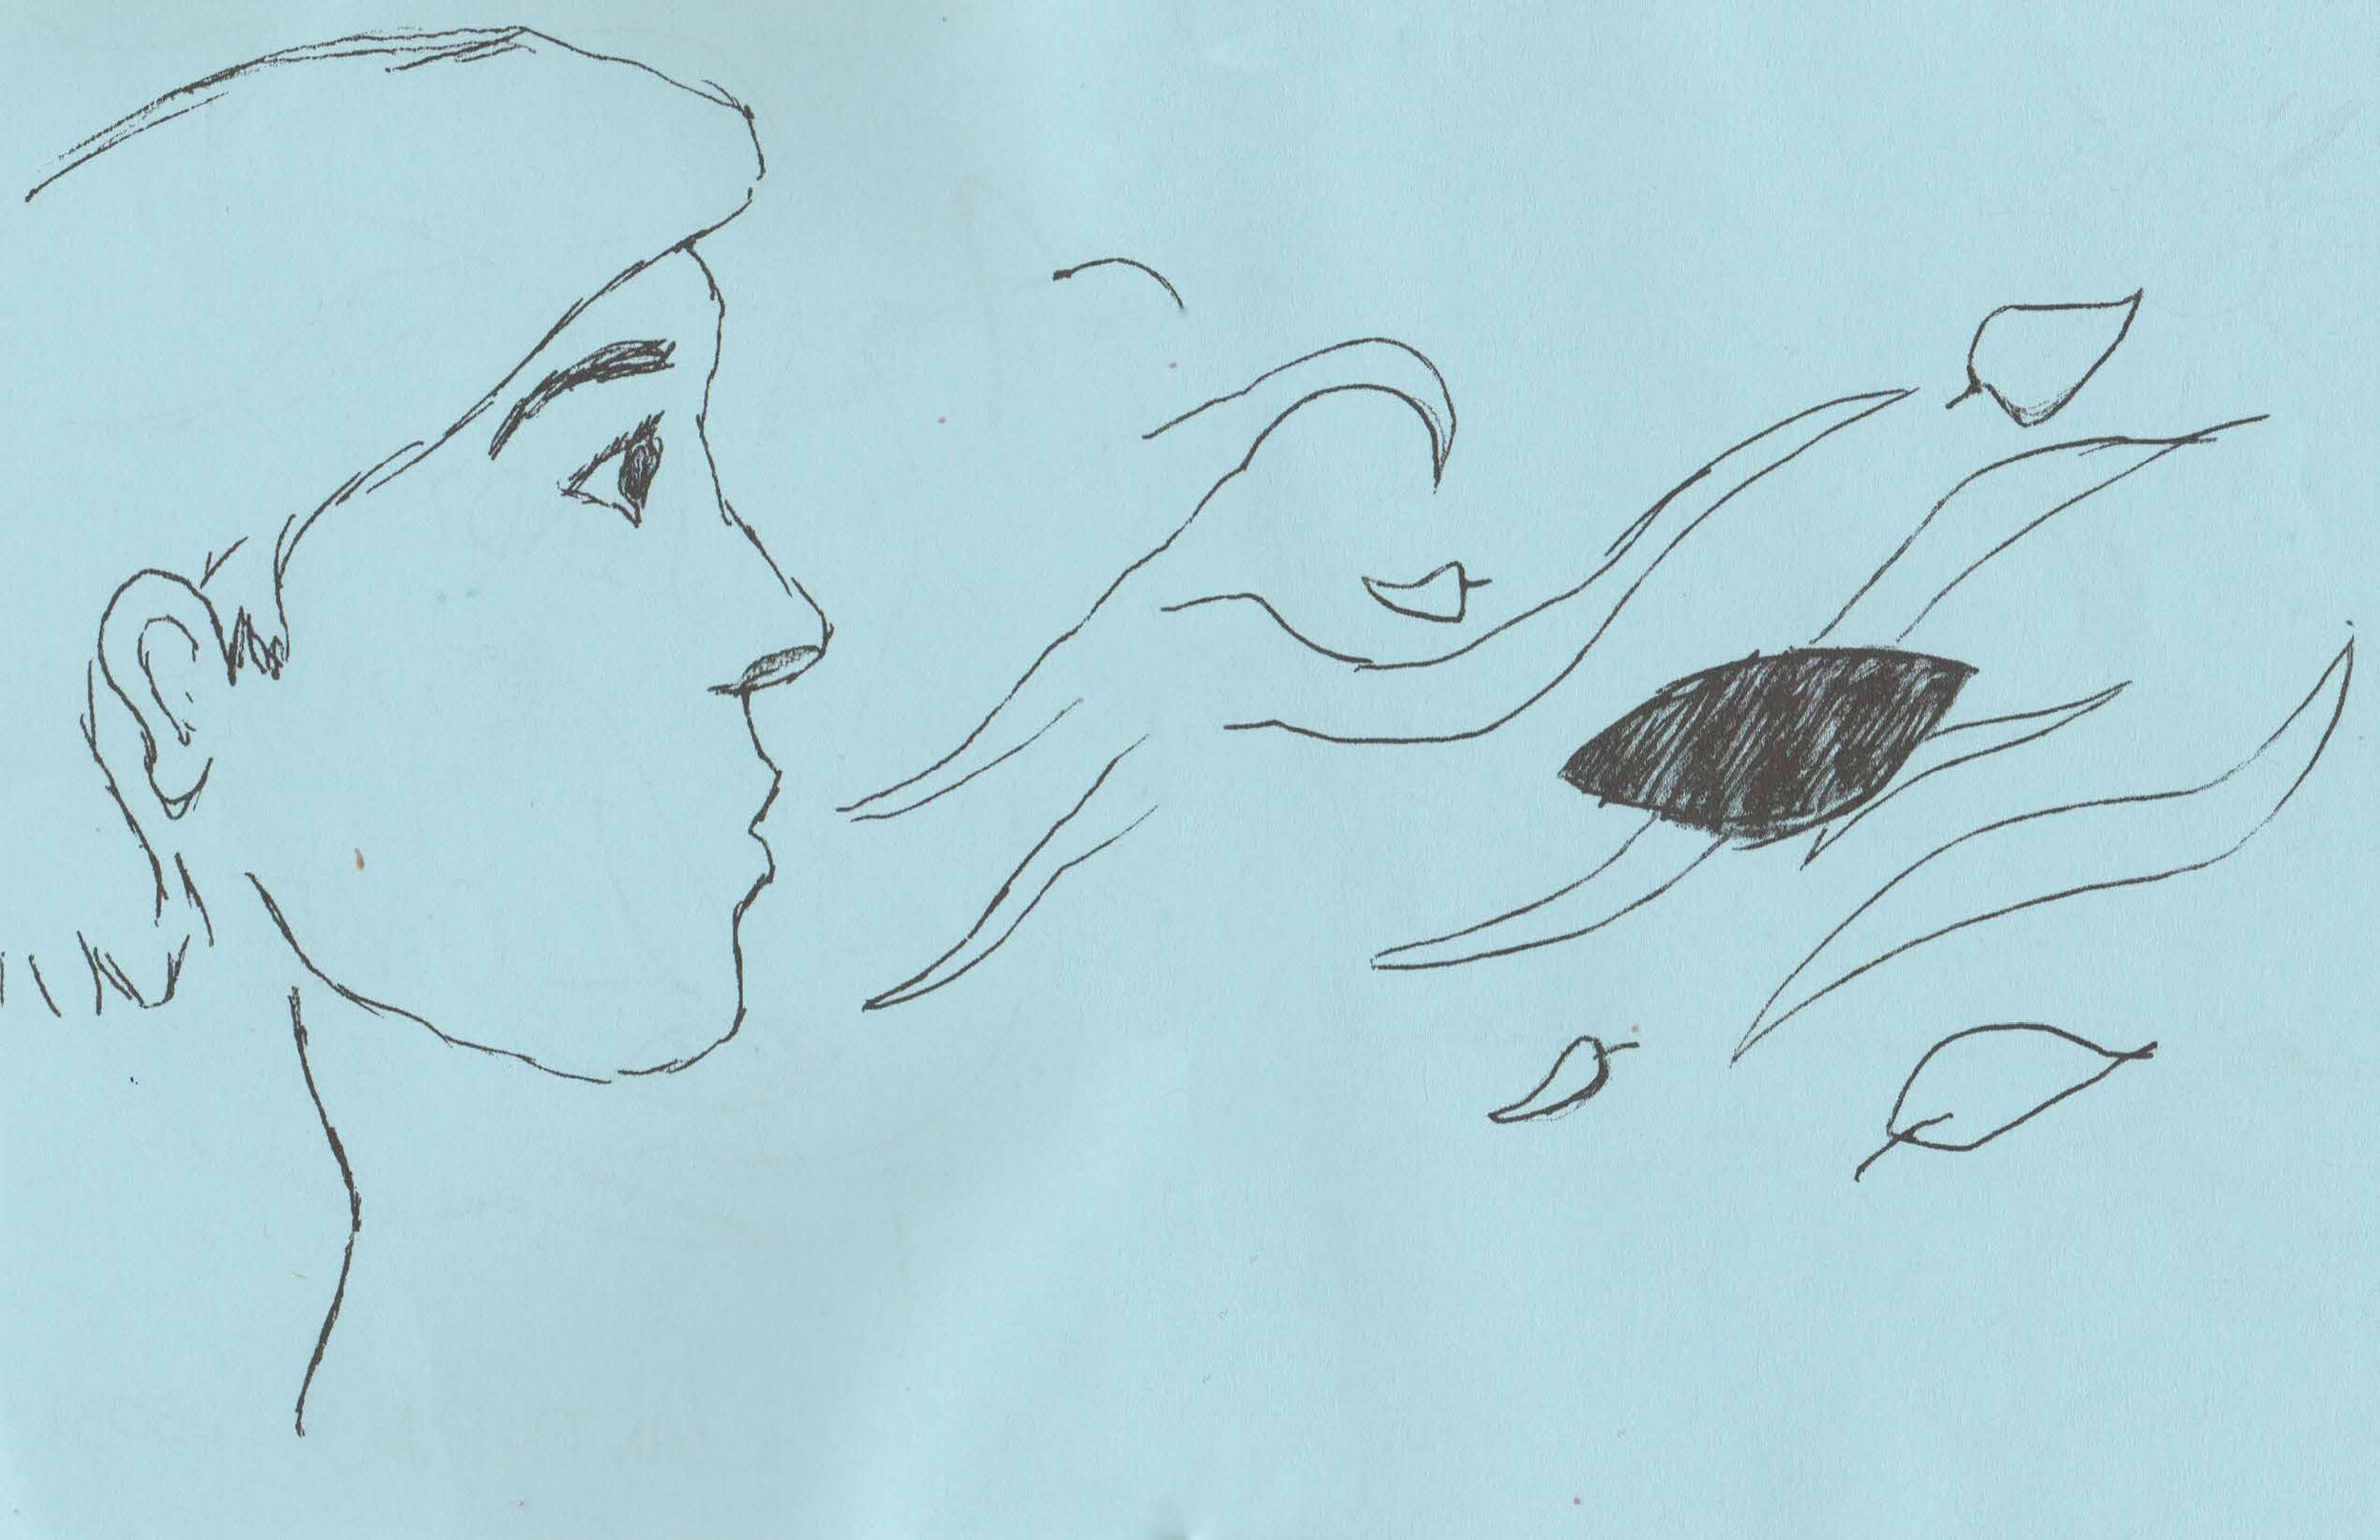 Windy Love_Page_2_Image_0001.jpg